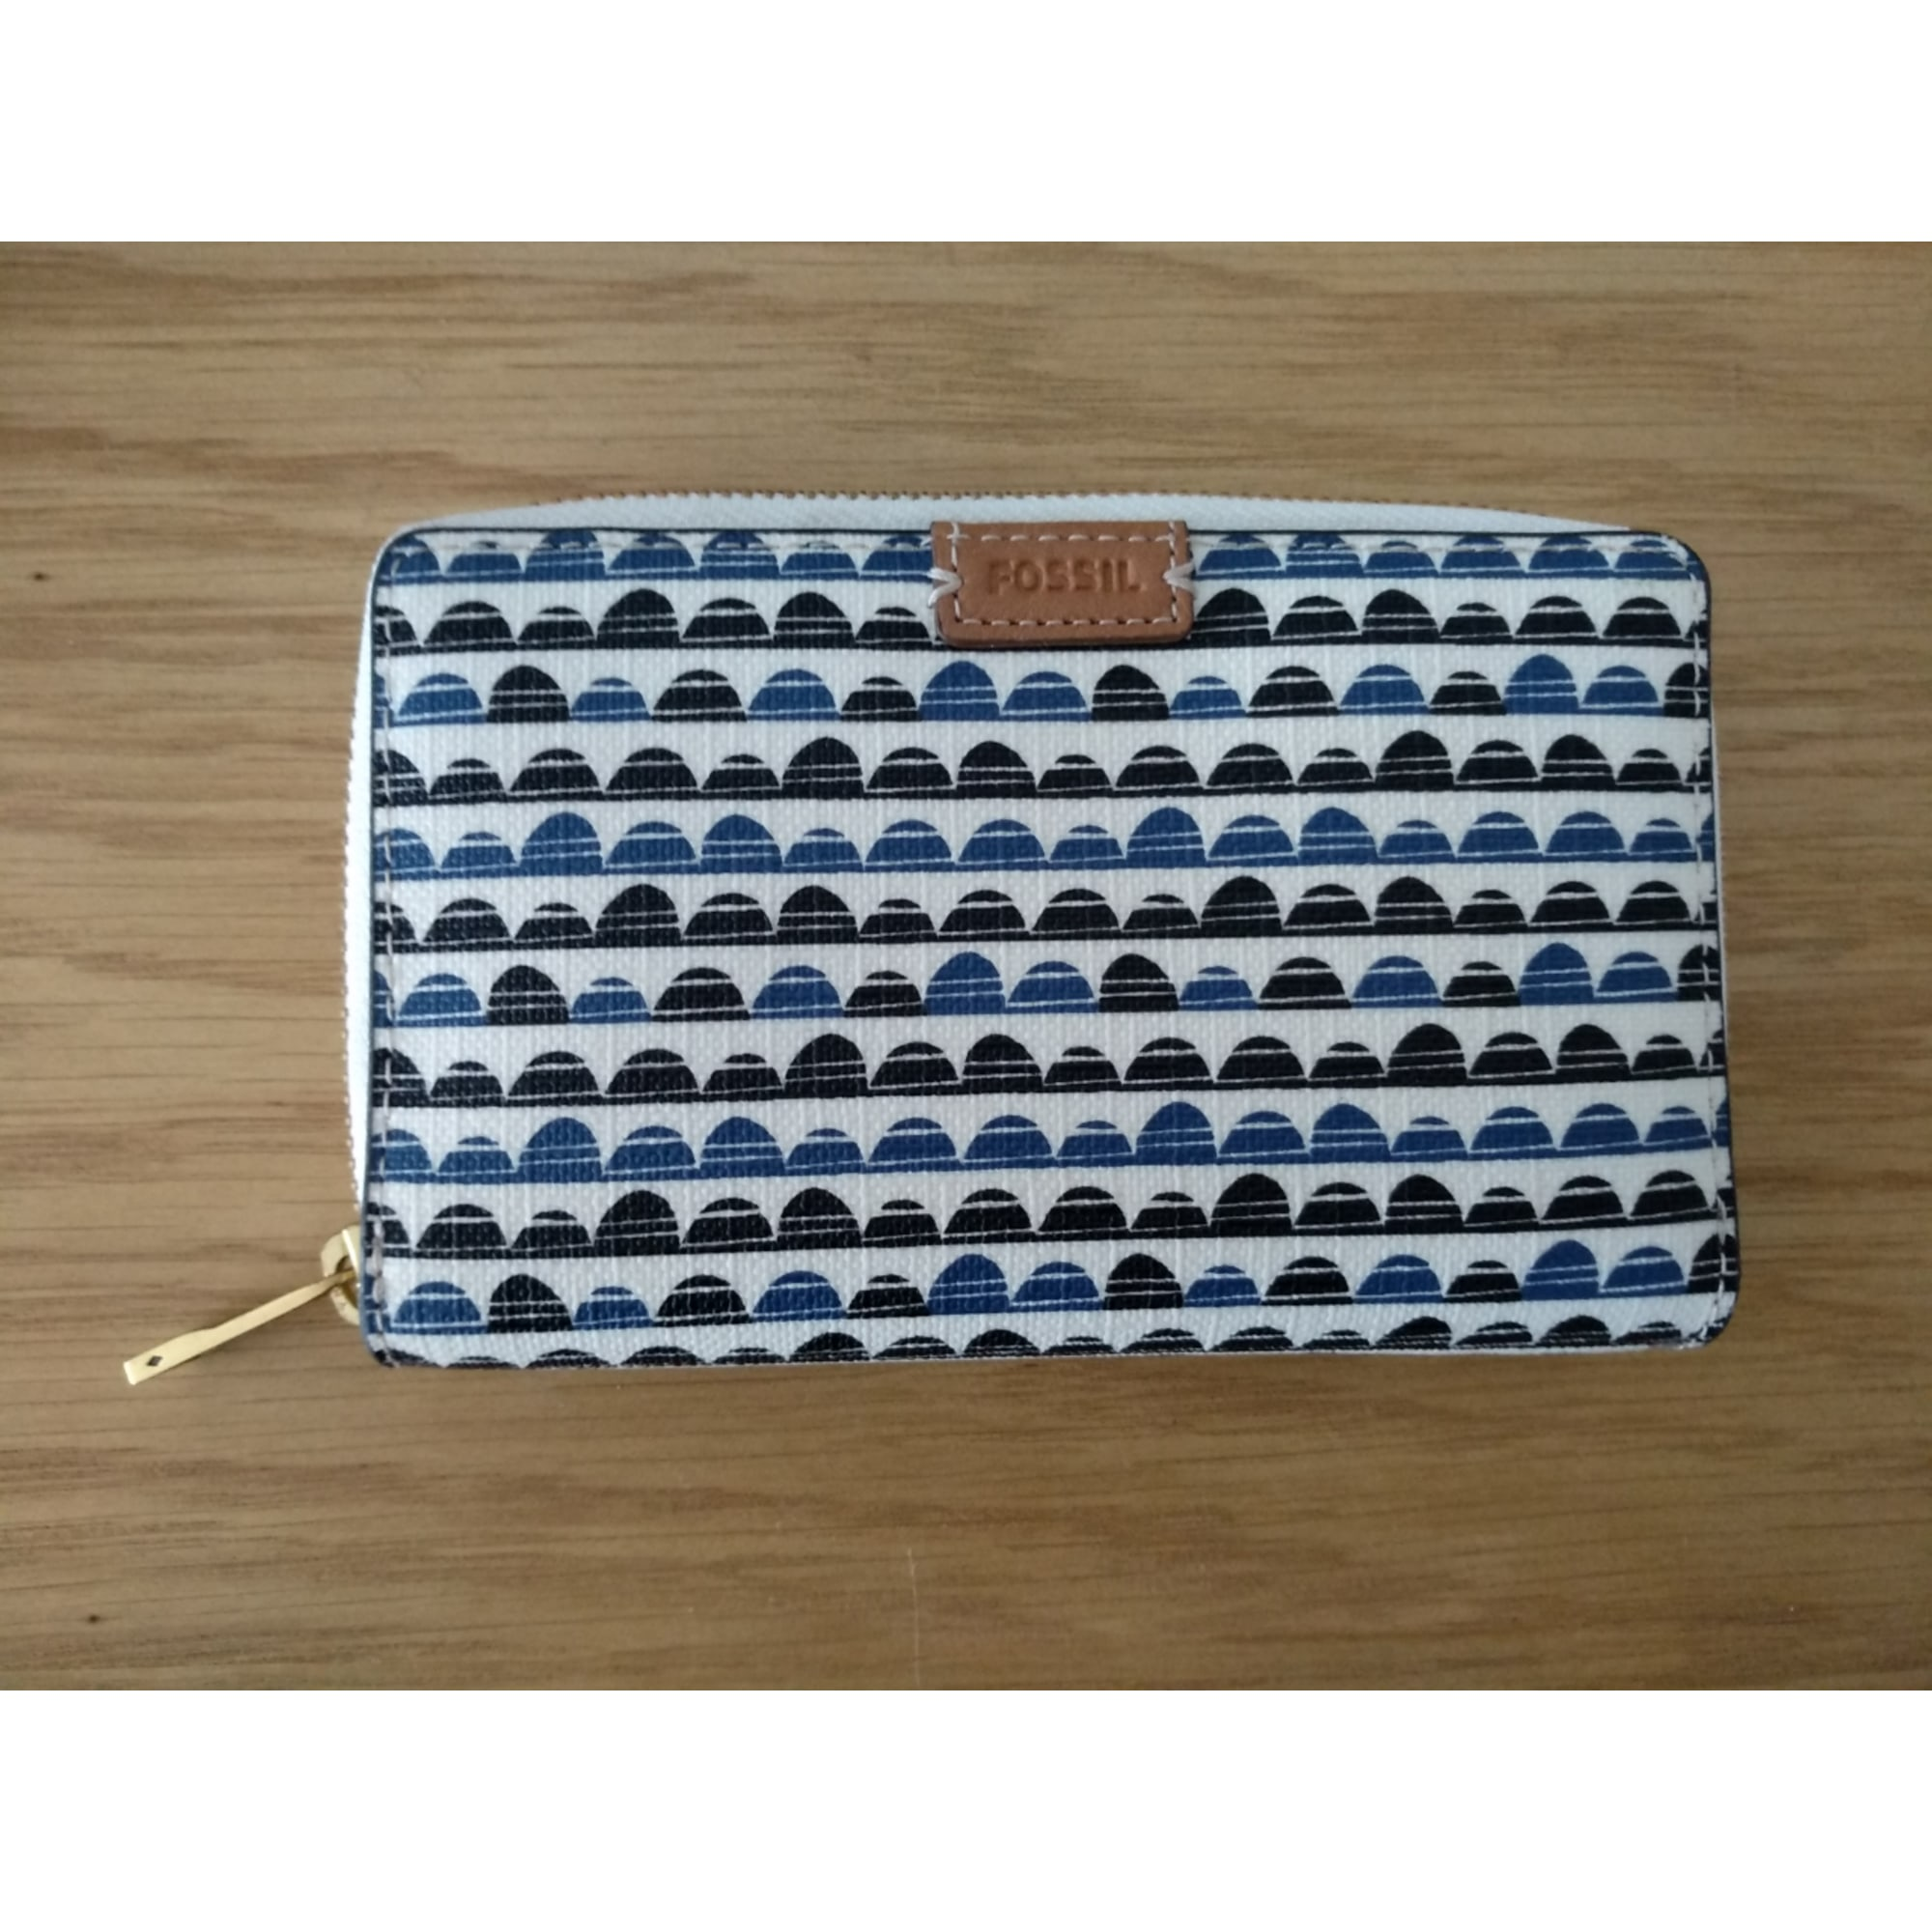 Portefeuille FOSSIL Bleu, bleu marine, bleu turquoise